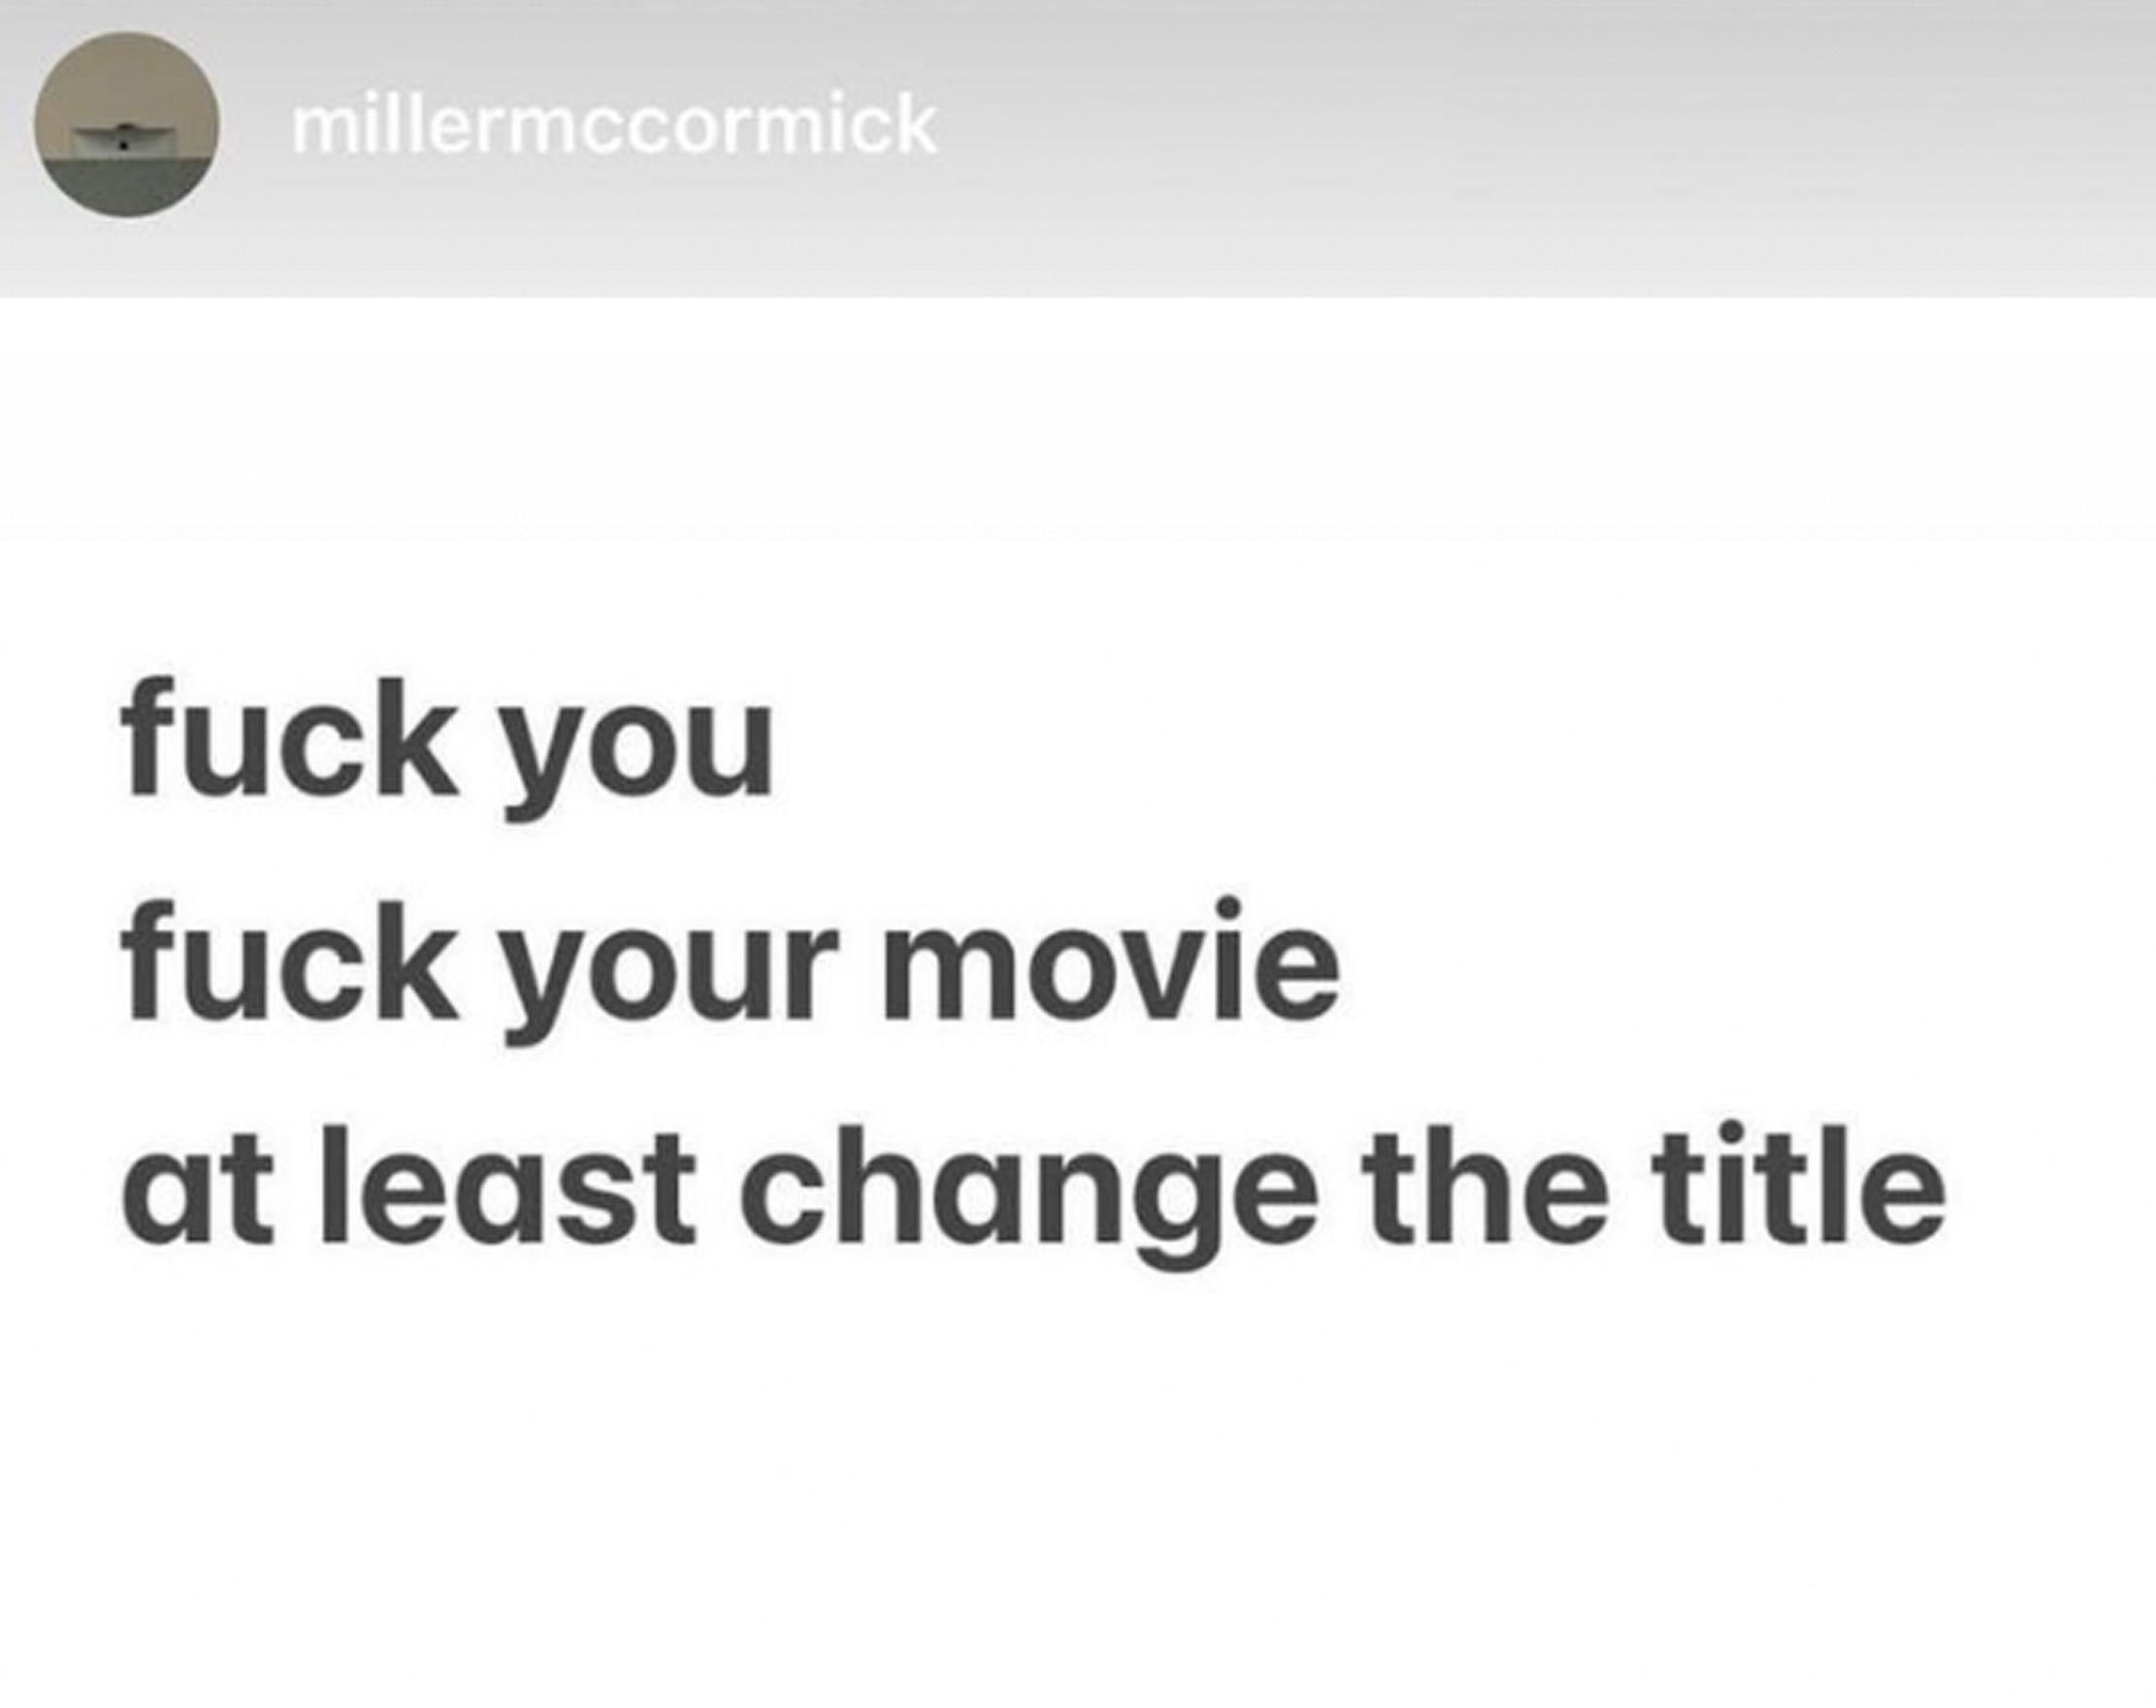 Miller McCormick, broren til Mac Miller alias Malcolm James McCormick, reagerer på filmen med Machine Gun Kelly som Mac (Instagram/millermccormick)